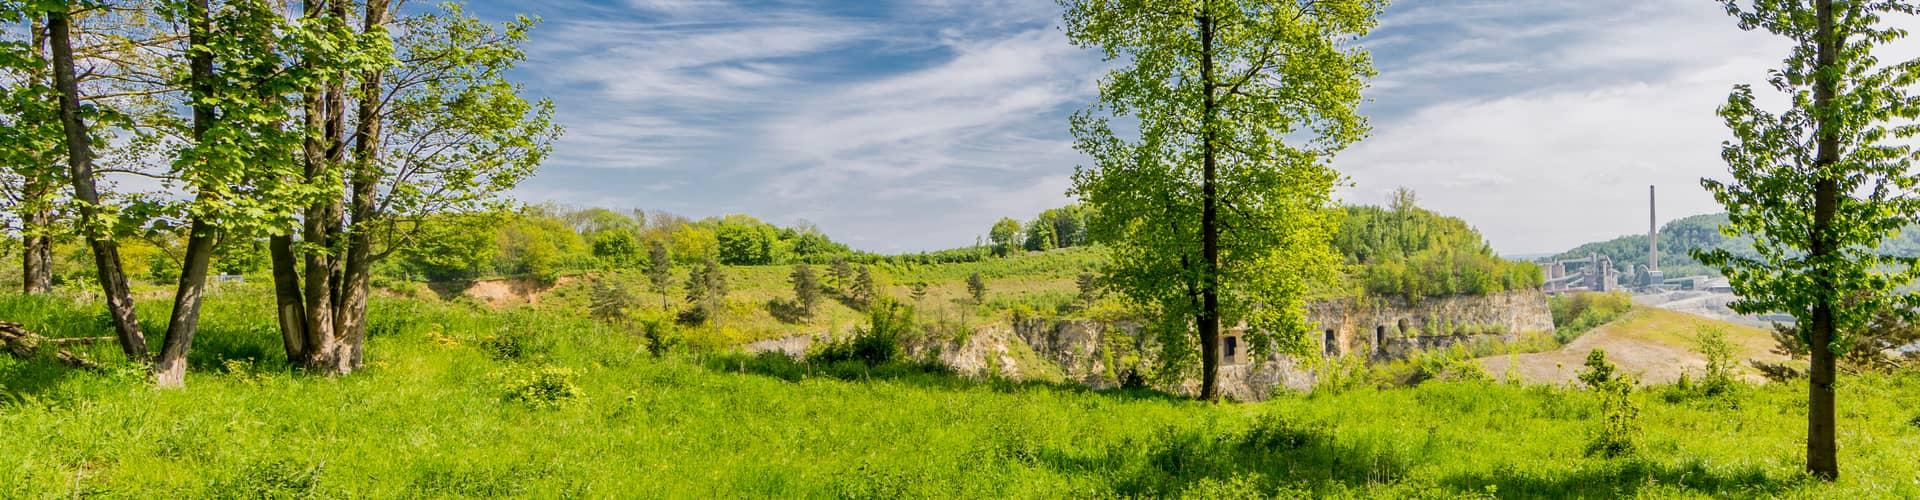 Kamperen in Limburg